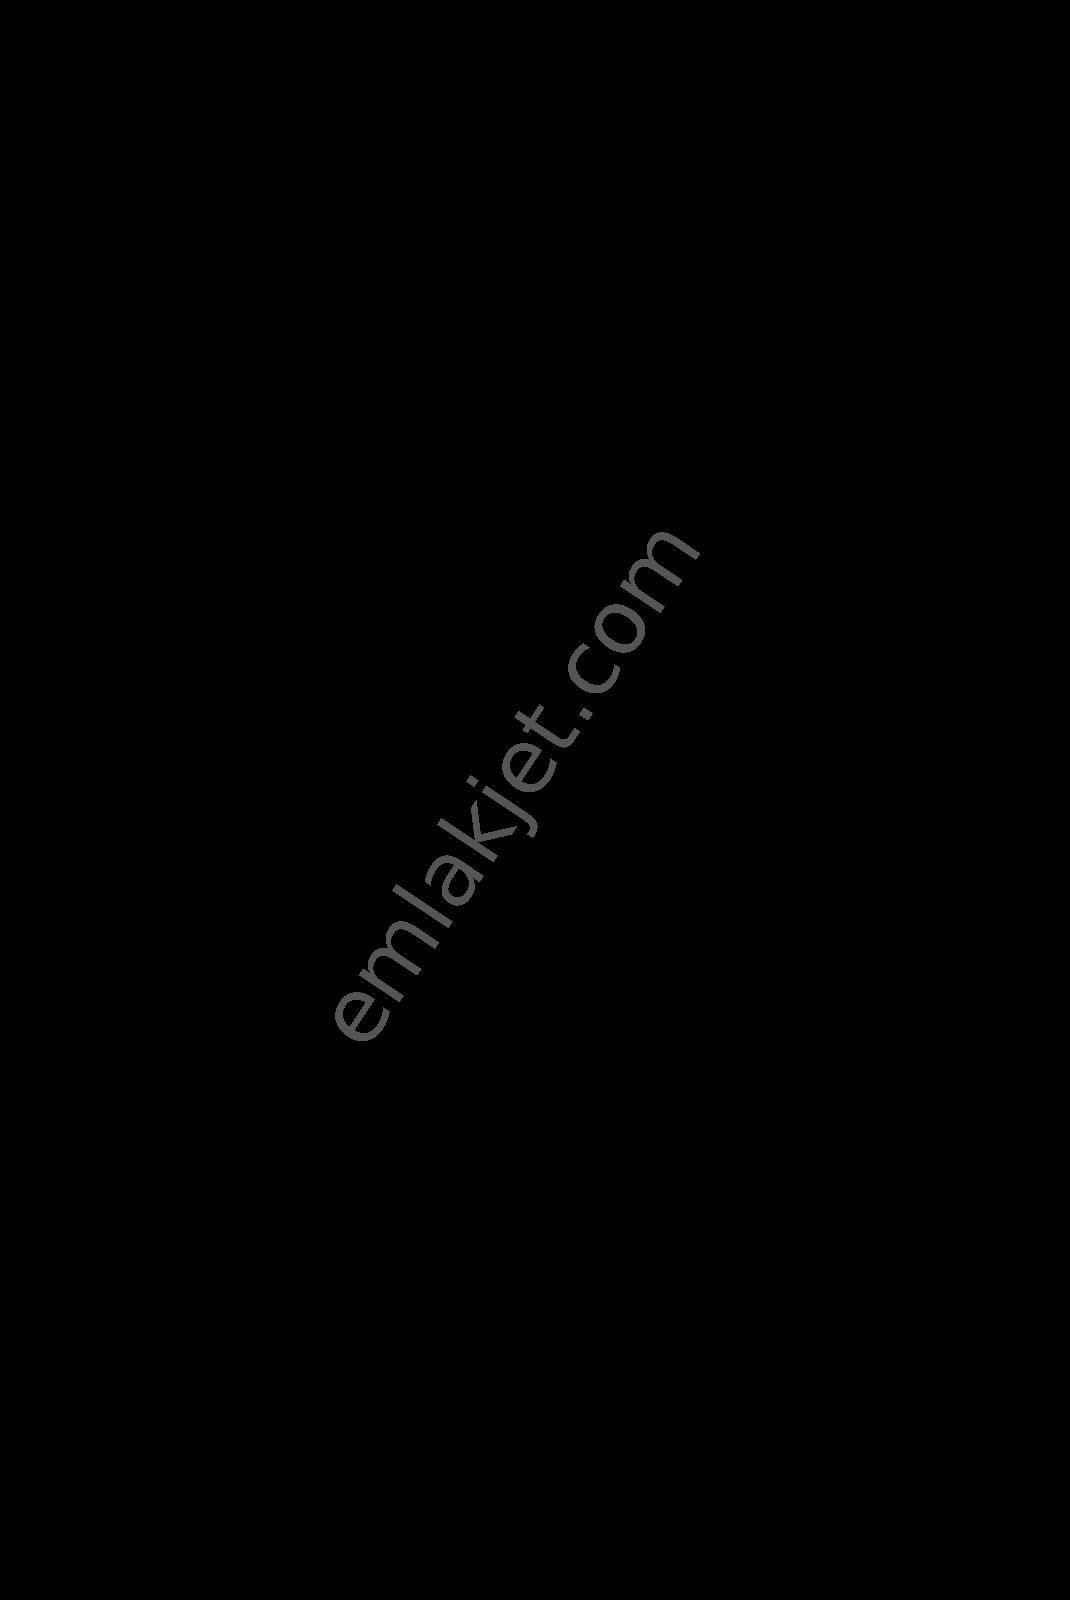 https://imaj.emlakjet.com/listing/9406389/B15C5C85F1F992EB24838CB3A431A8199406389.jpg